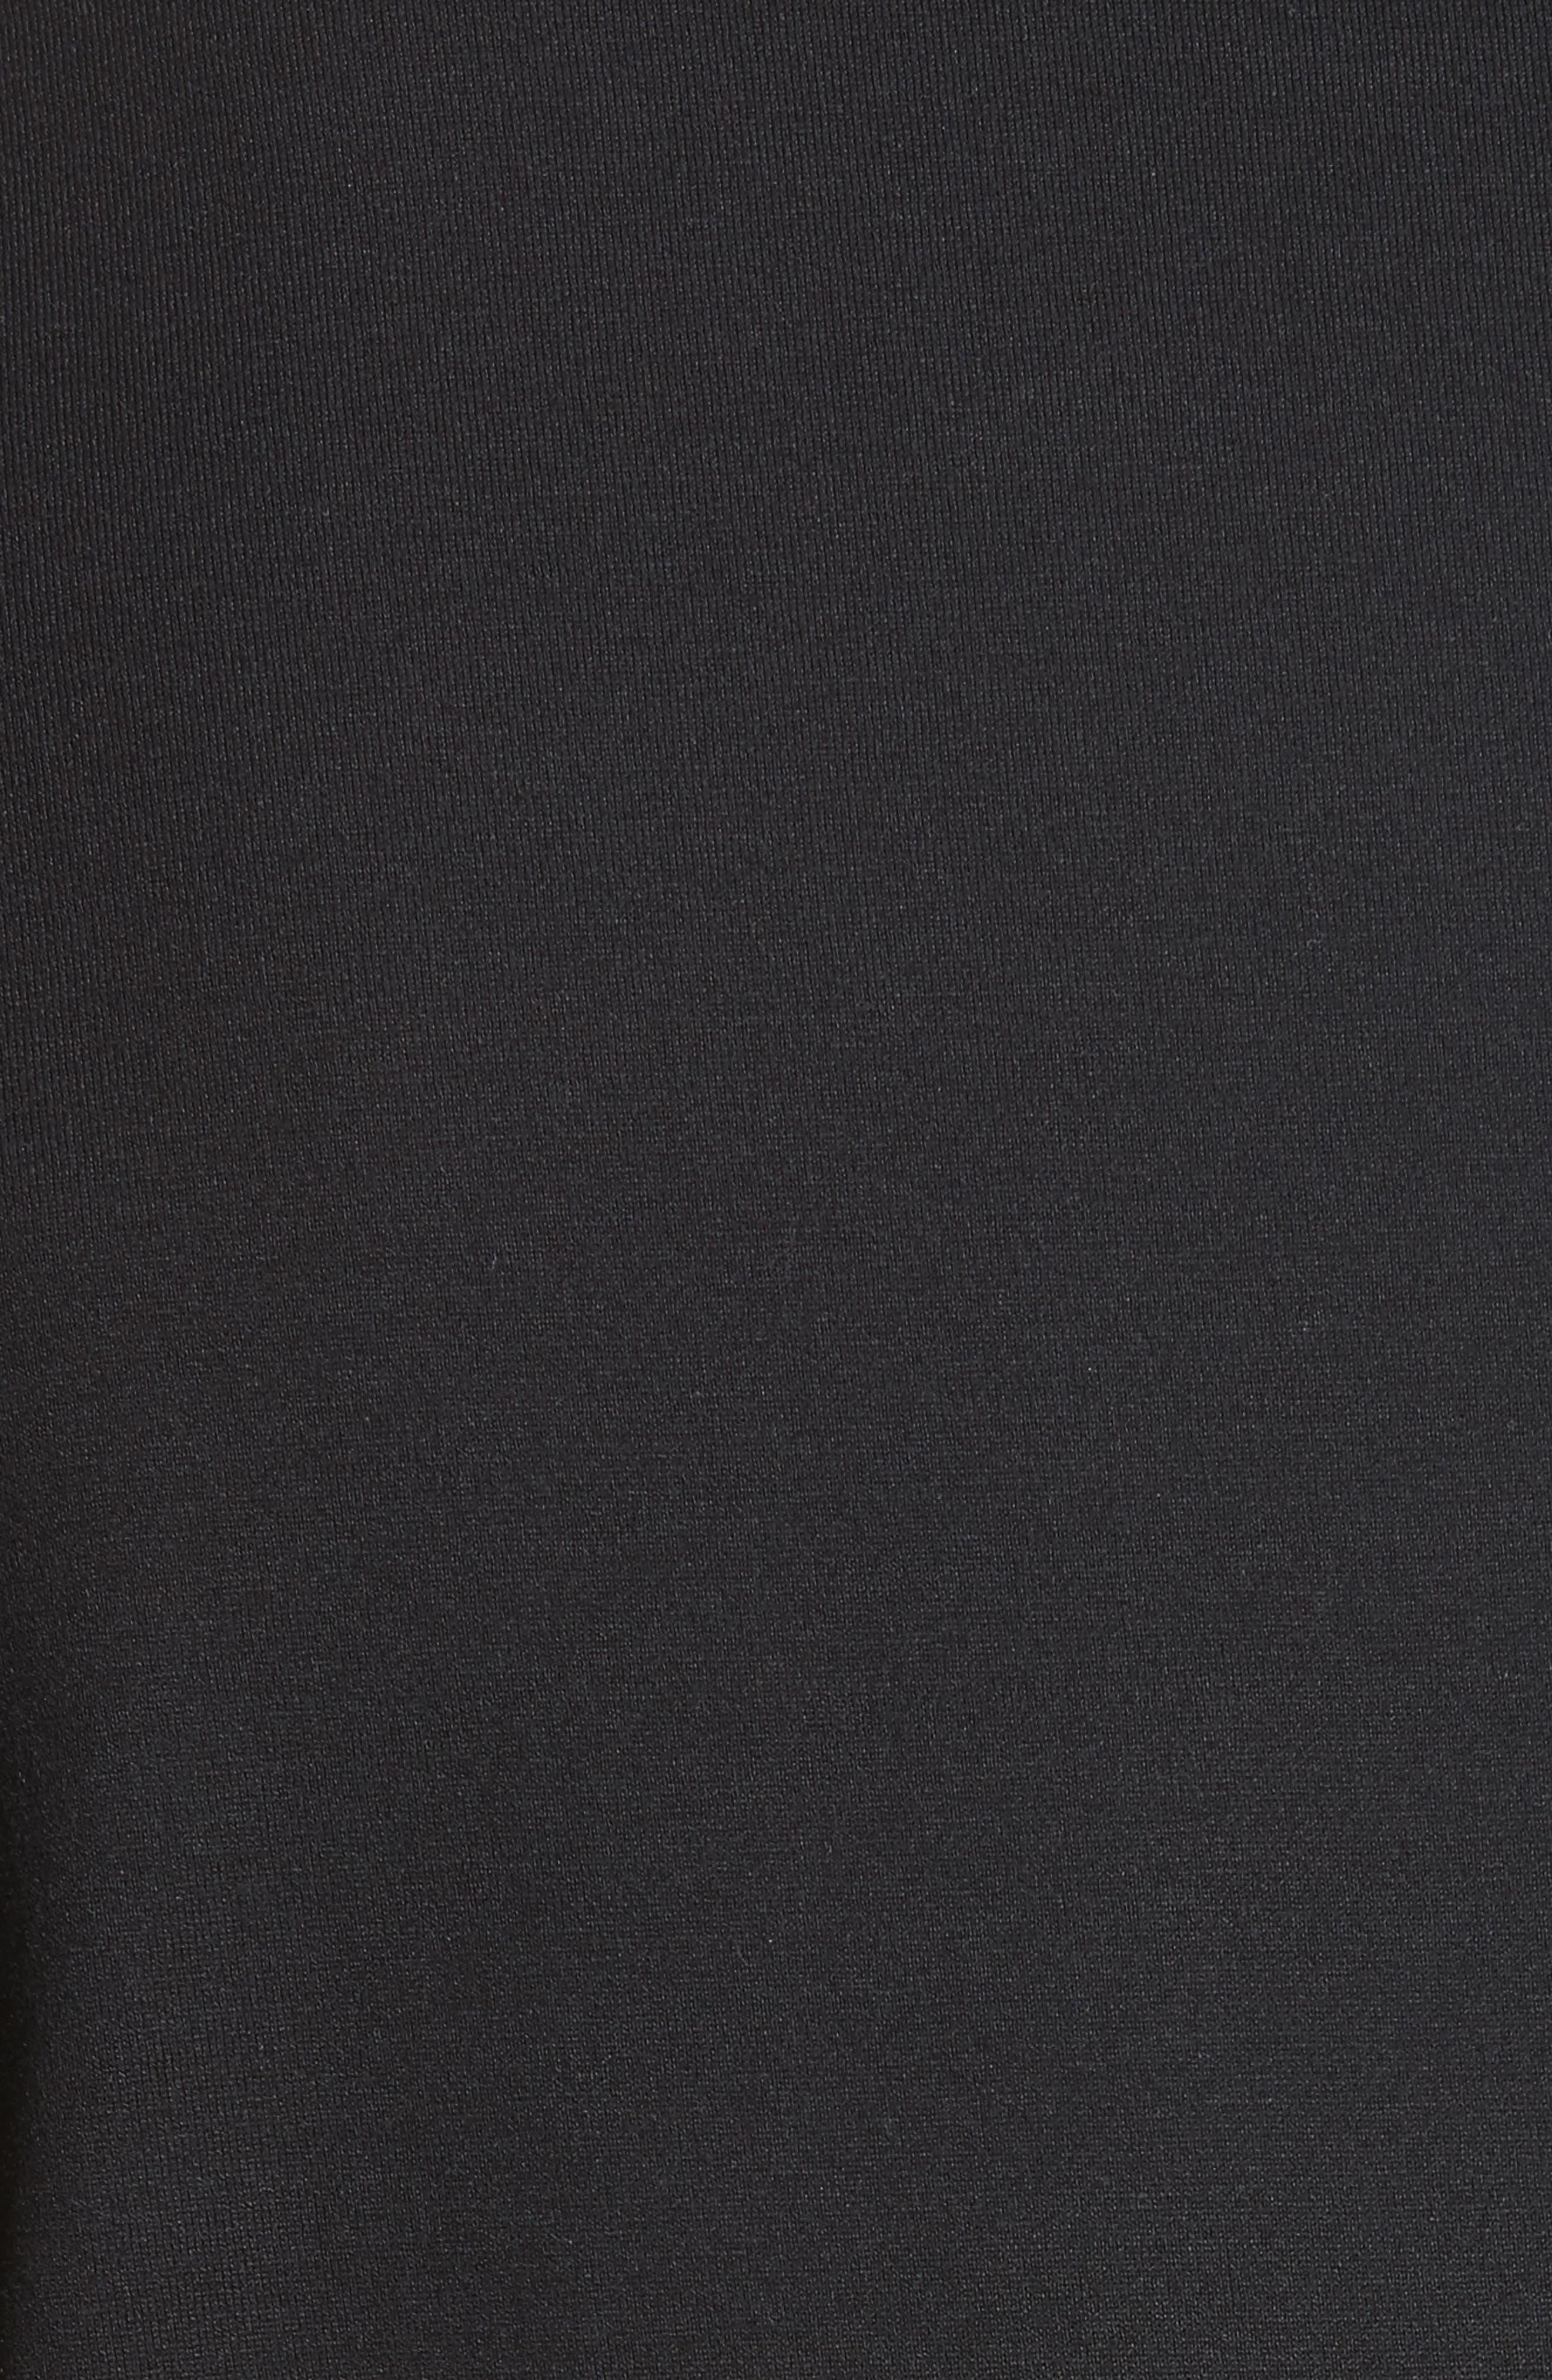 LA House Graphic T-Shirt,                             Alternate thumbnail 5, color,                             Black